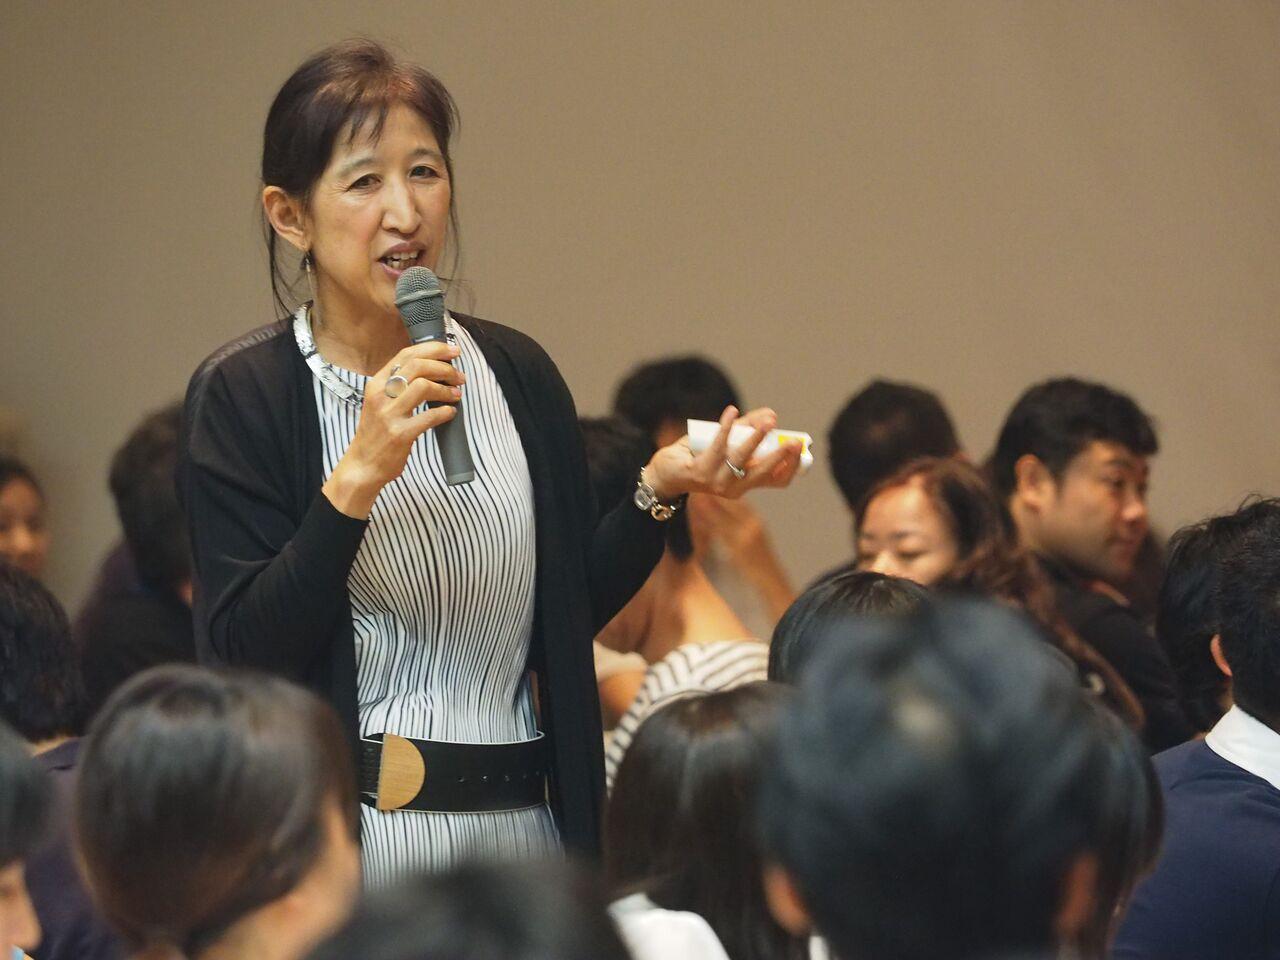 Vital Japan - 英語セミナー・交流会。日本最大級の英語コミュニティー・英会話サークル